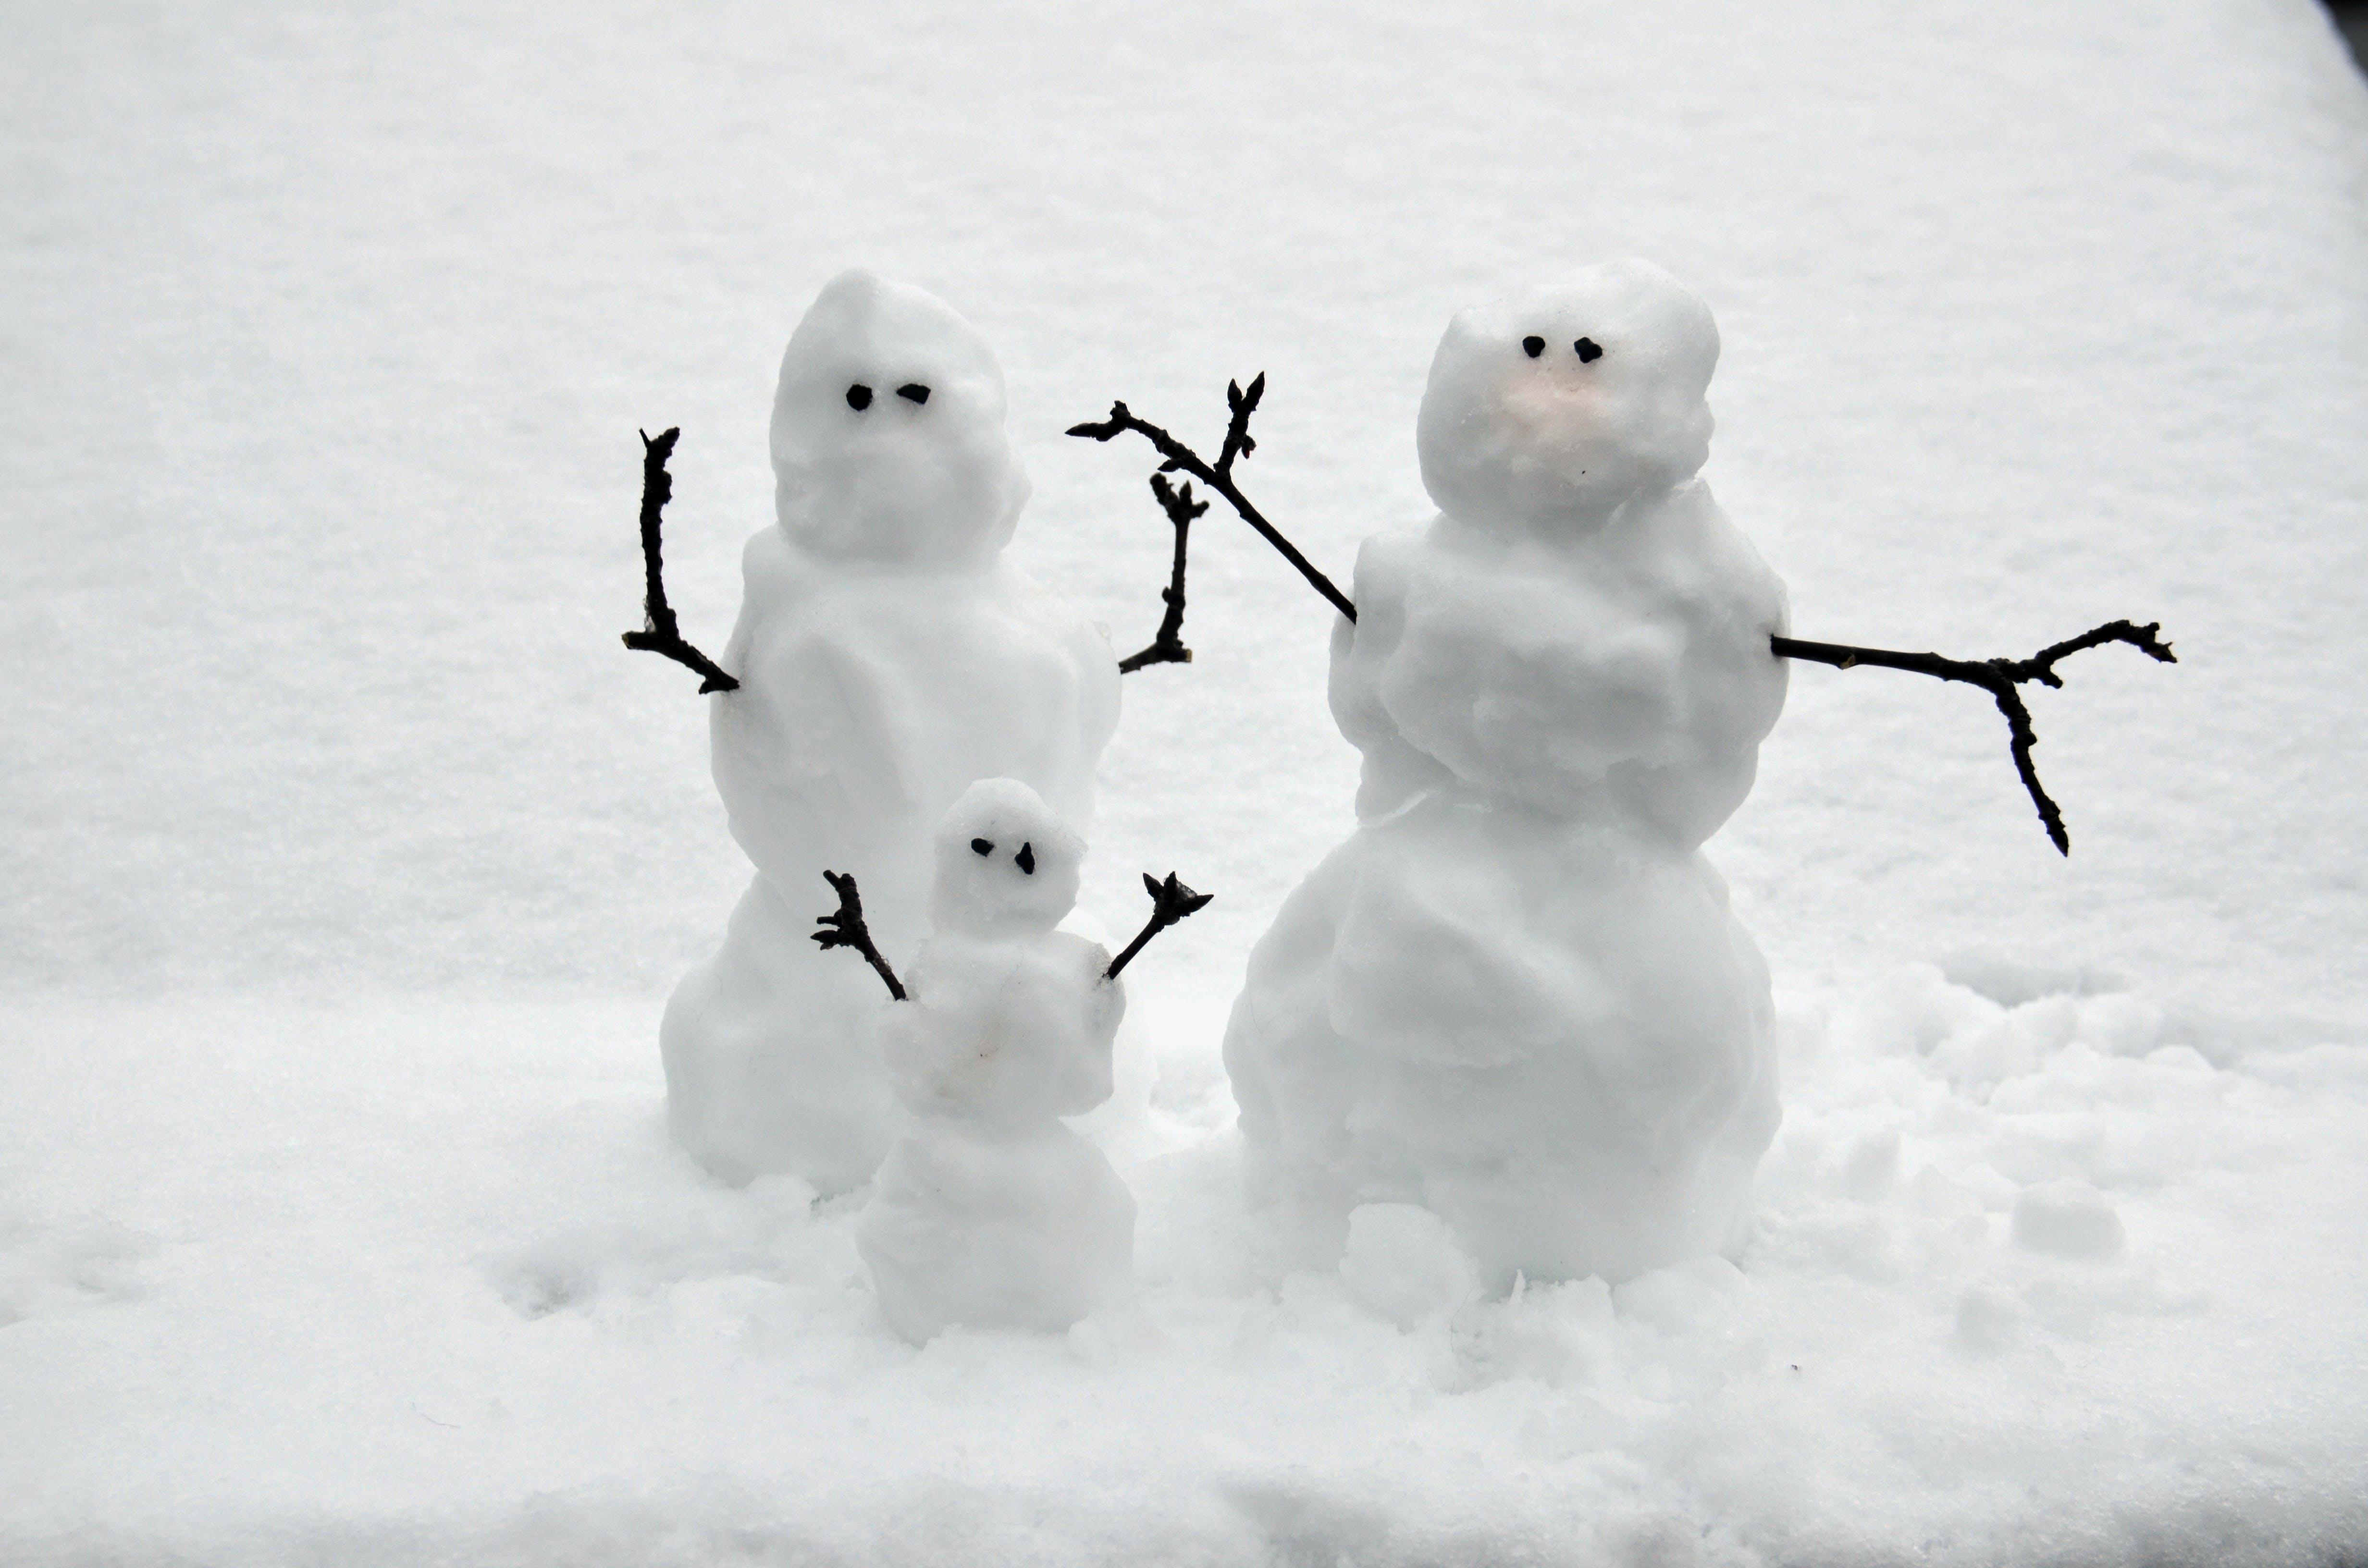 Free stock photo of snow, winter, snowman, snowmen